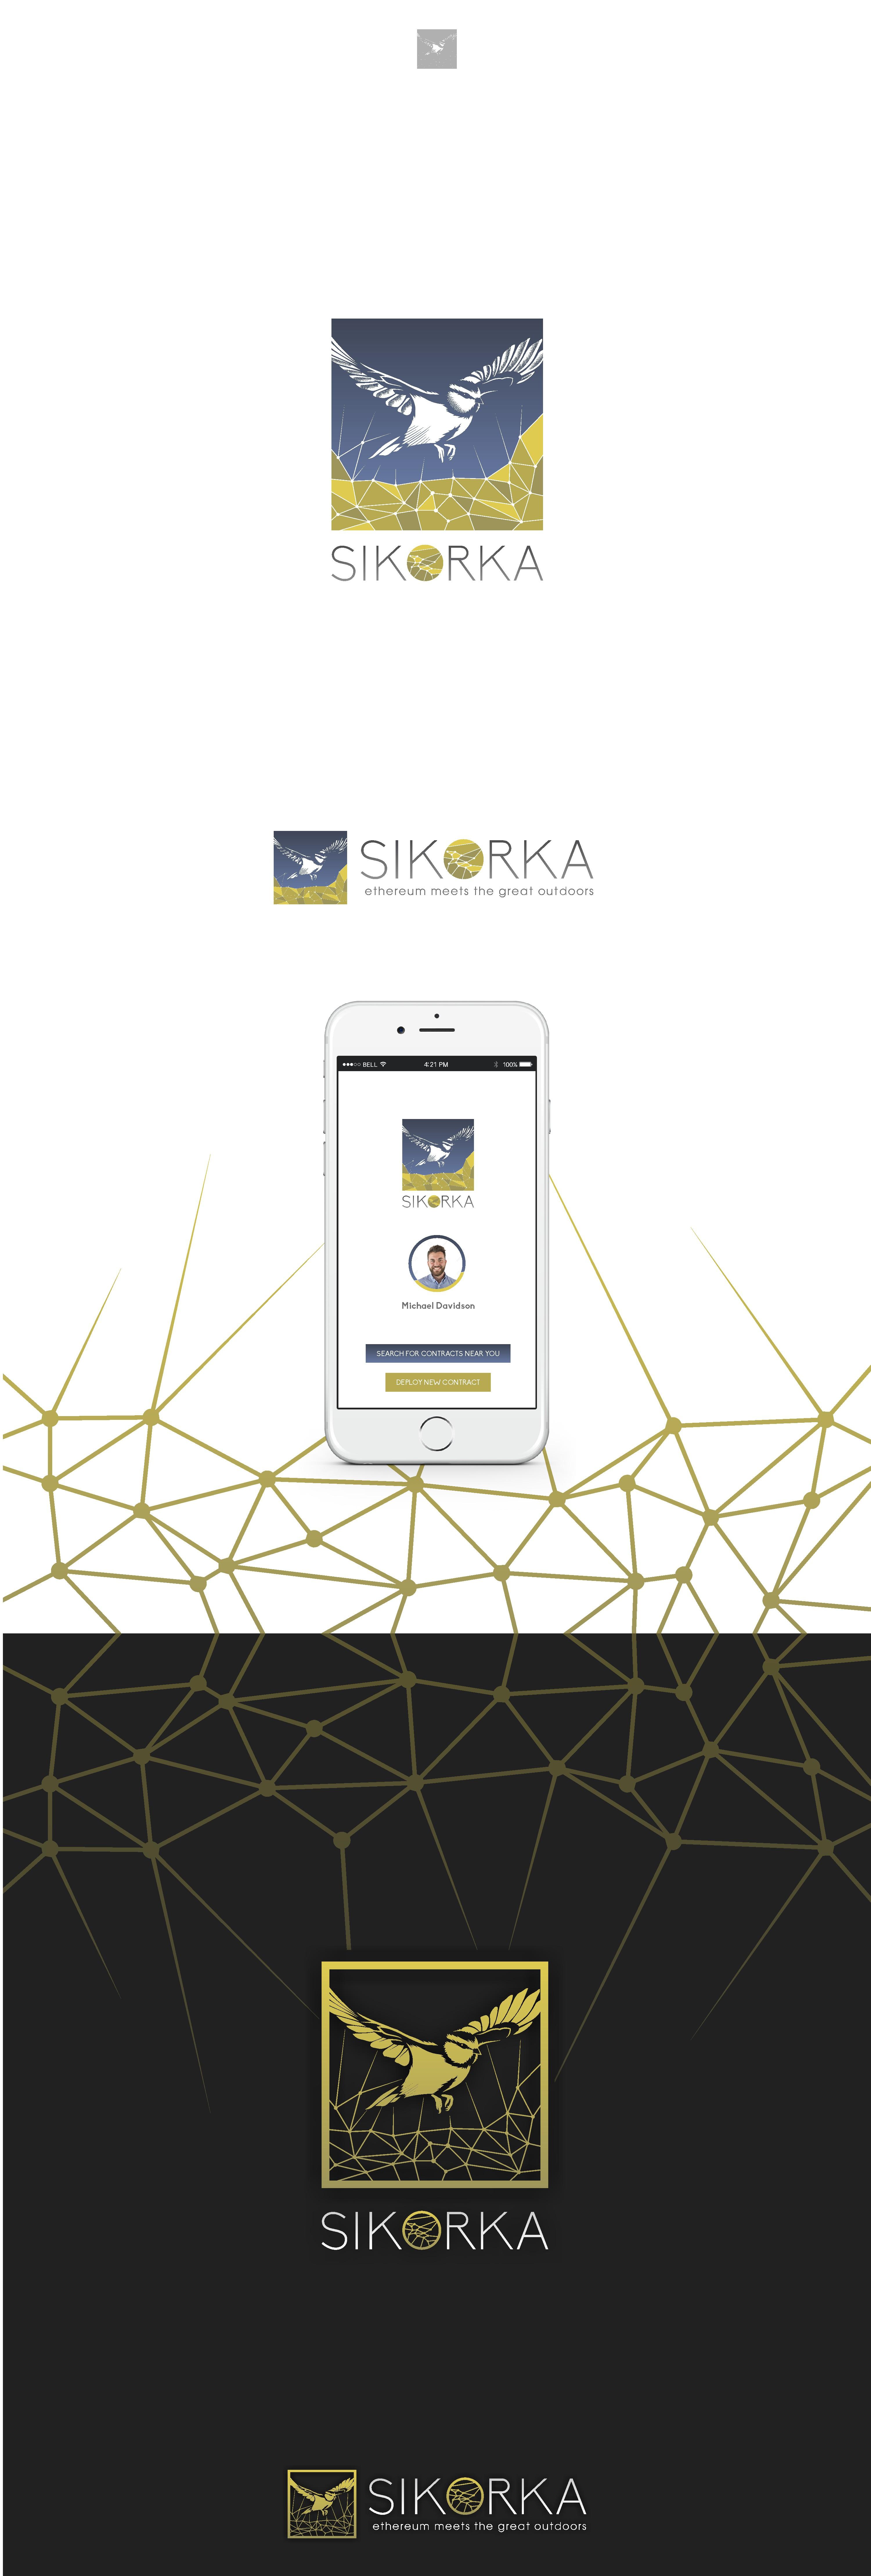 Design a mature bird-themed Logo for an innovative technology product!